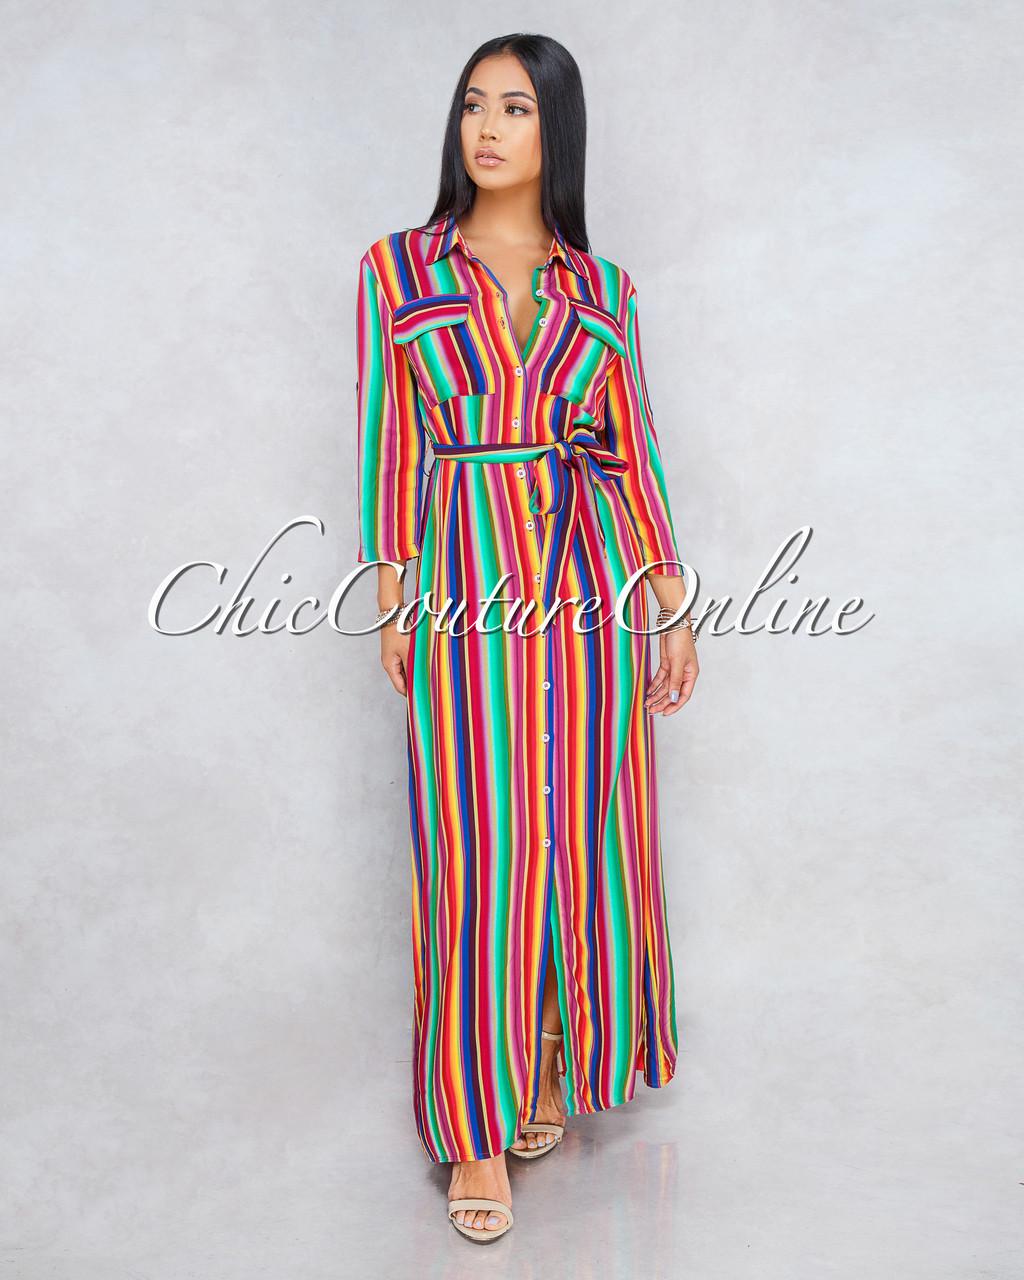 a04fc854d86d ... Stripes Shirt Maxi Dress. Price: $65.00. Image 1